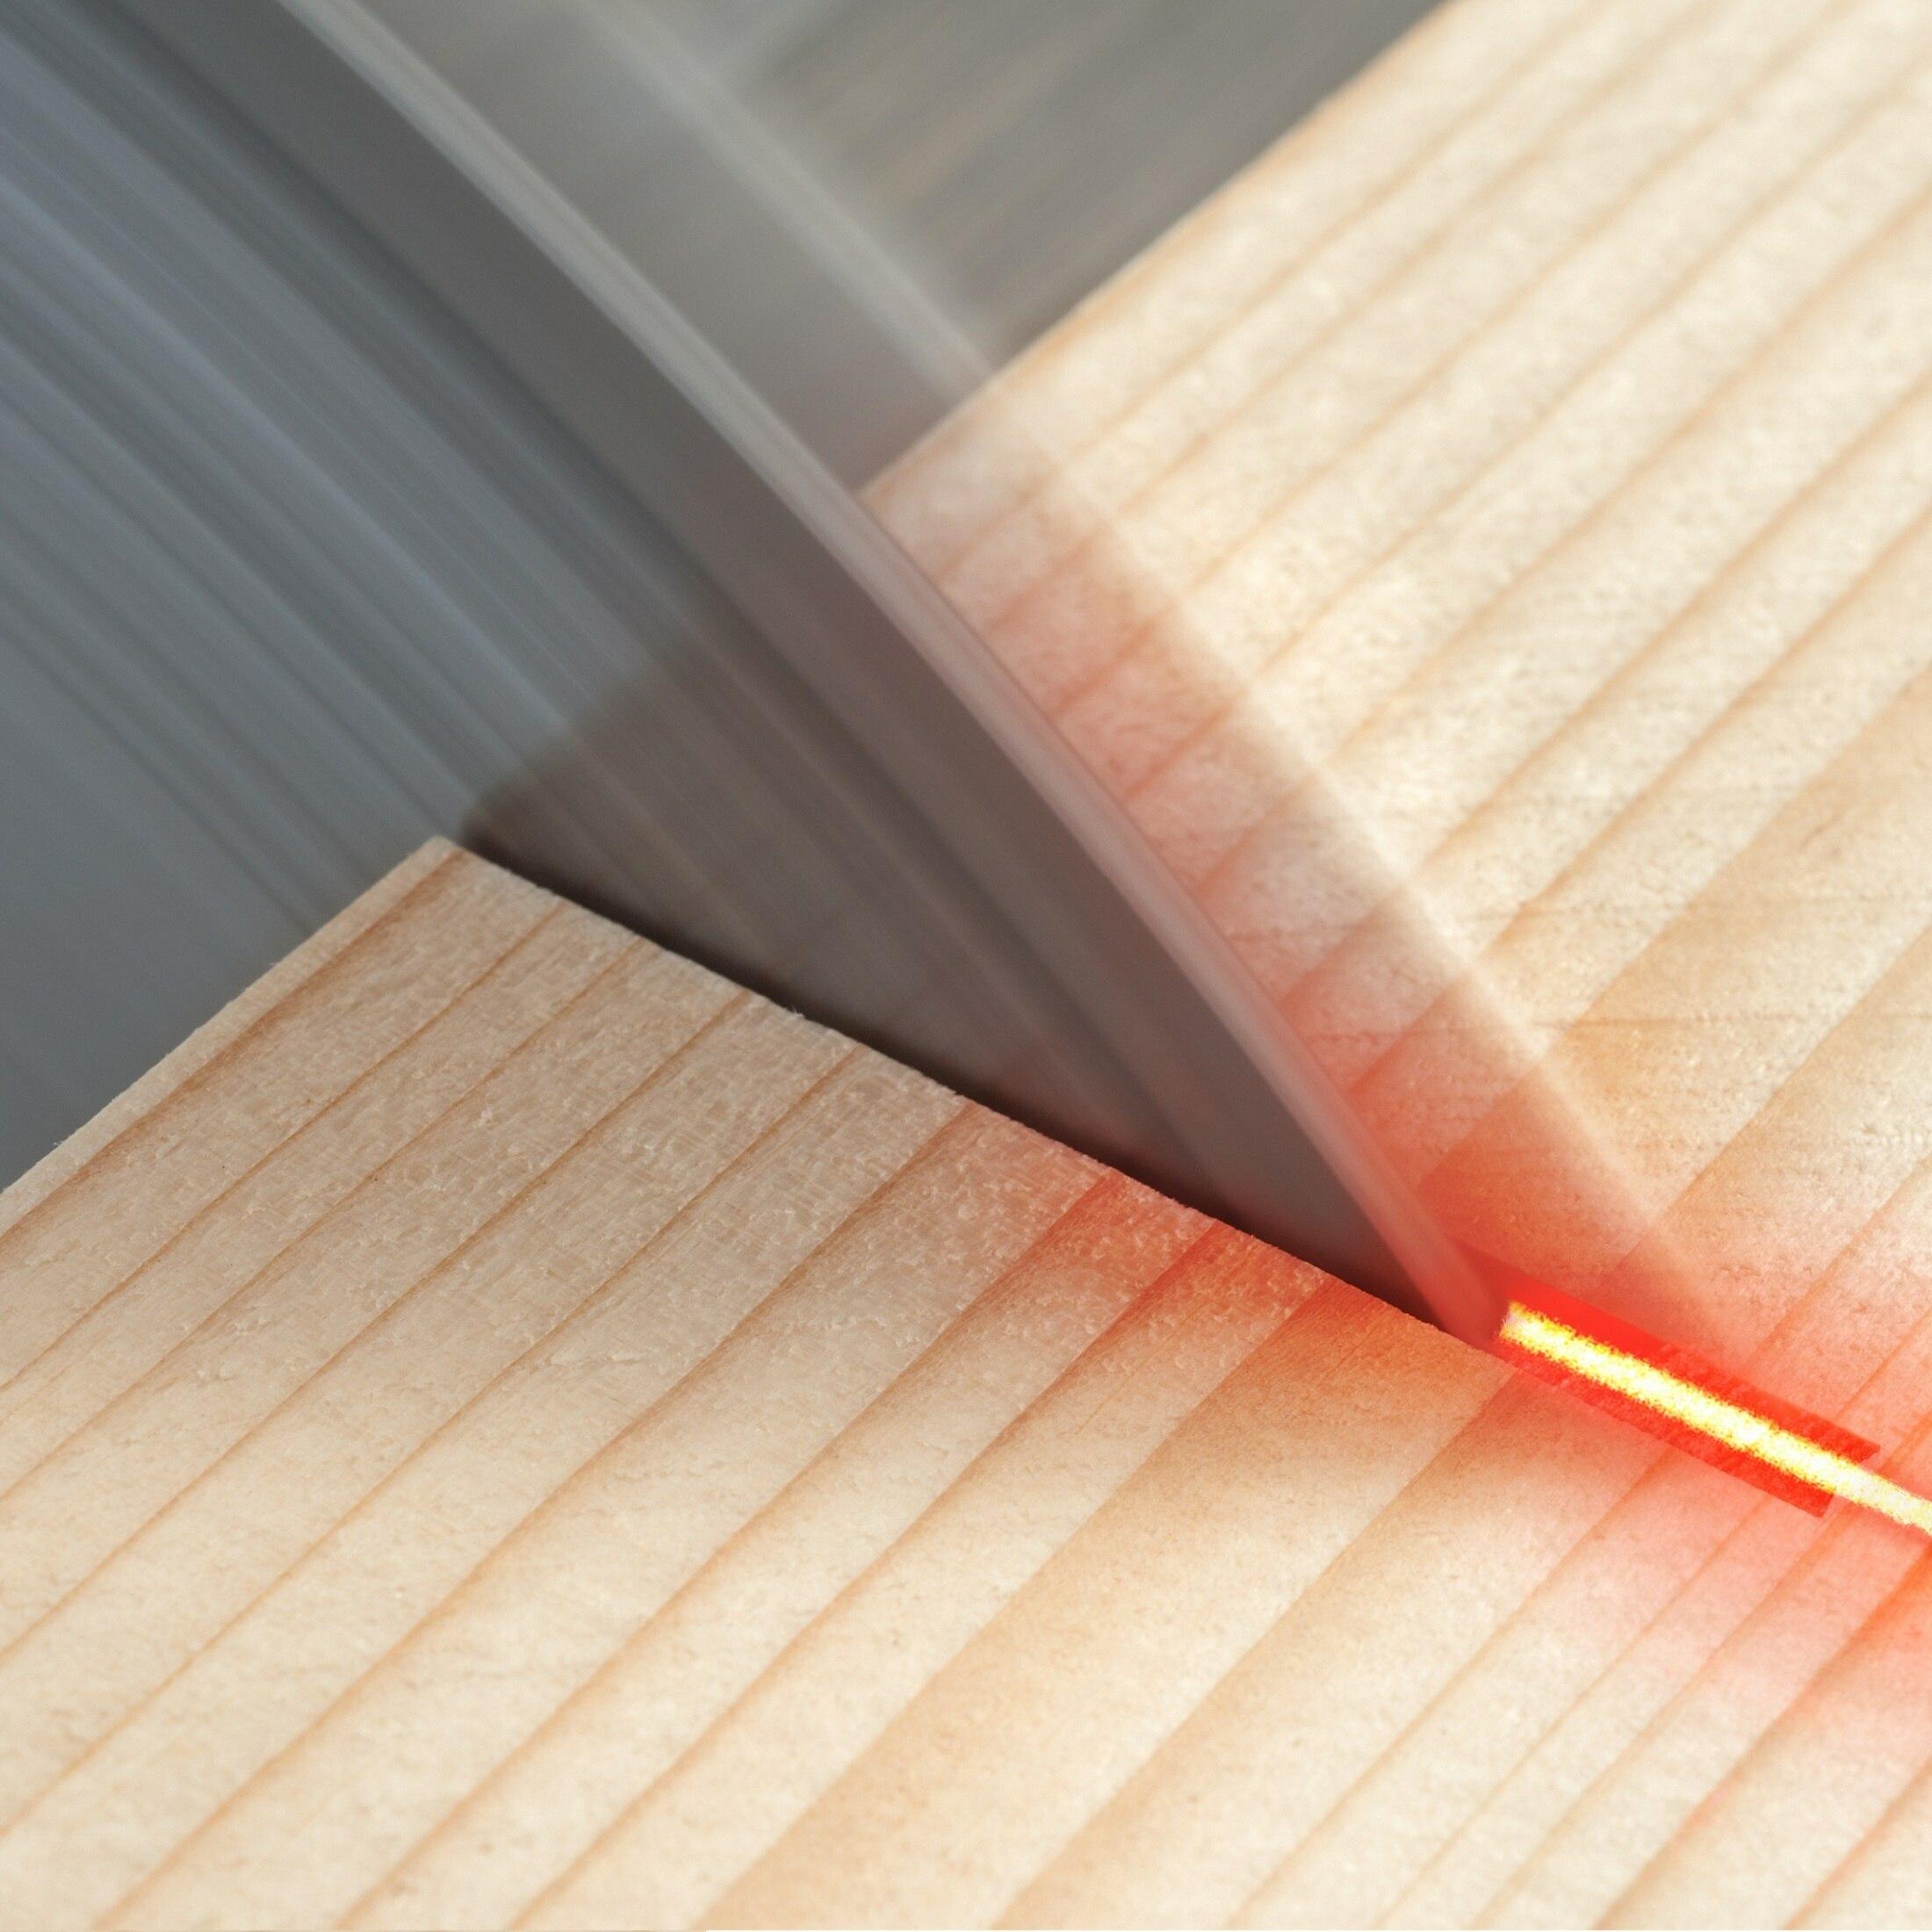 Picotronic Laser MLH650-5-12(22x90)45-F1500